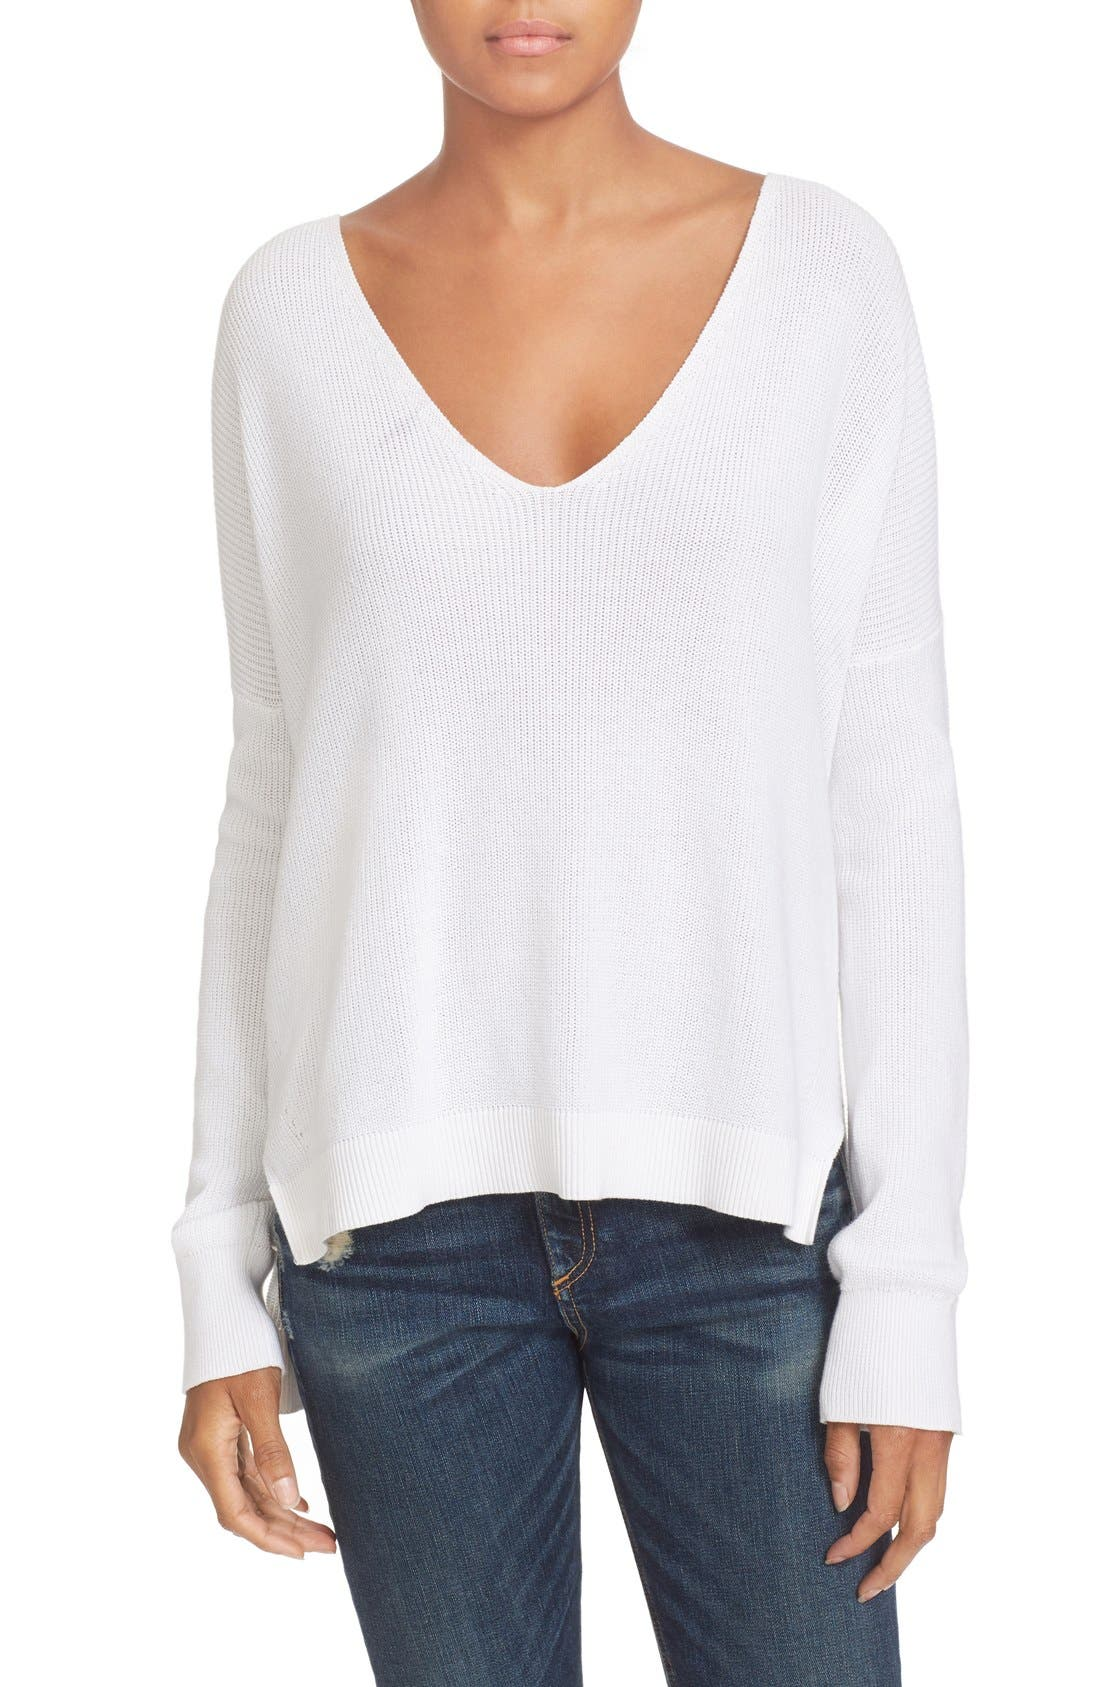 Alternate Image 1 Selected - rag & bone/JEAN Taylor Washed Cotton Sweater